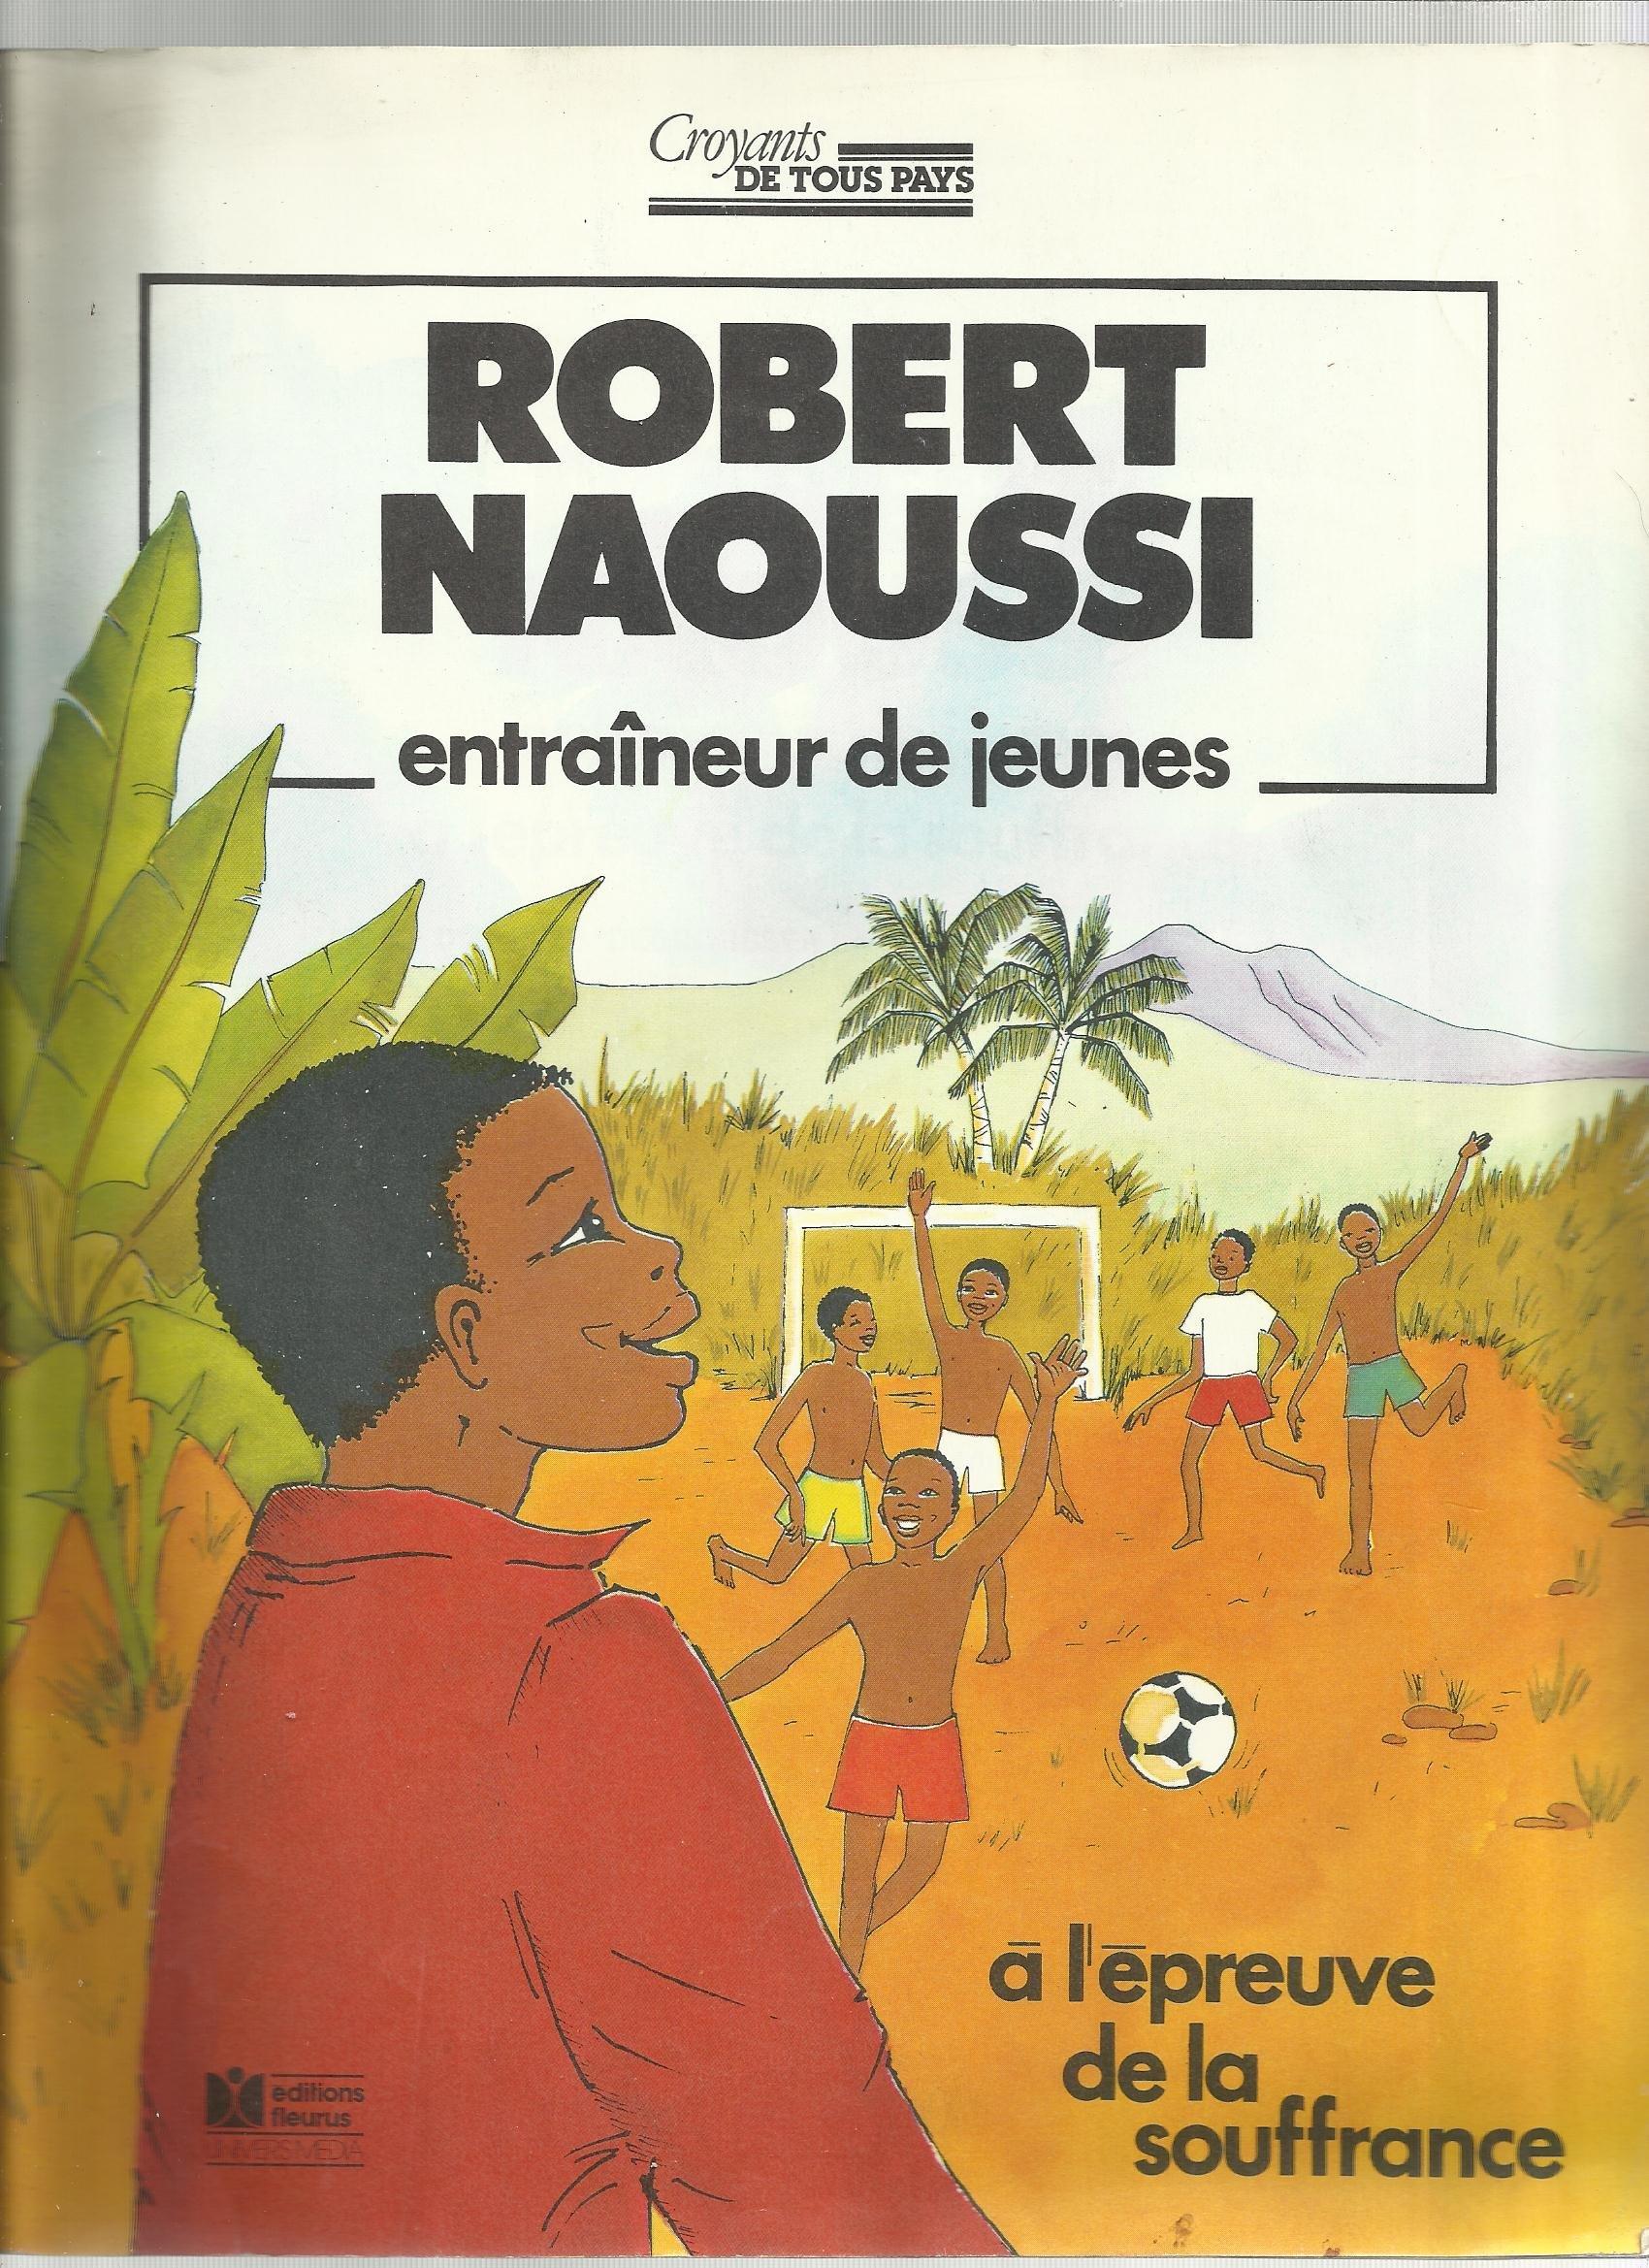 Robert Naoussi - entraîneur ds jeunes